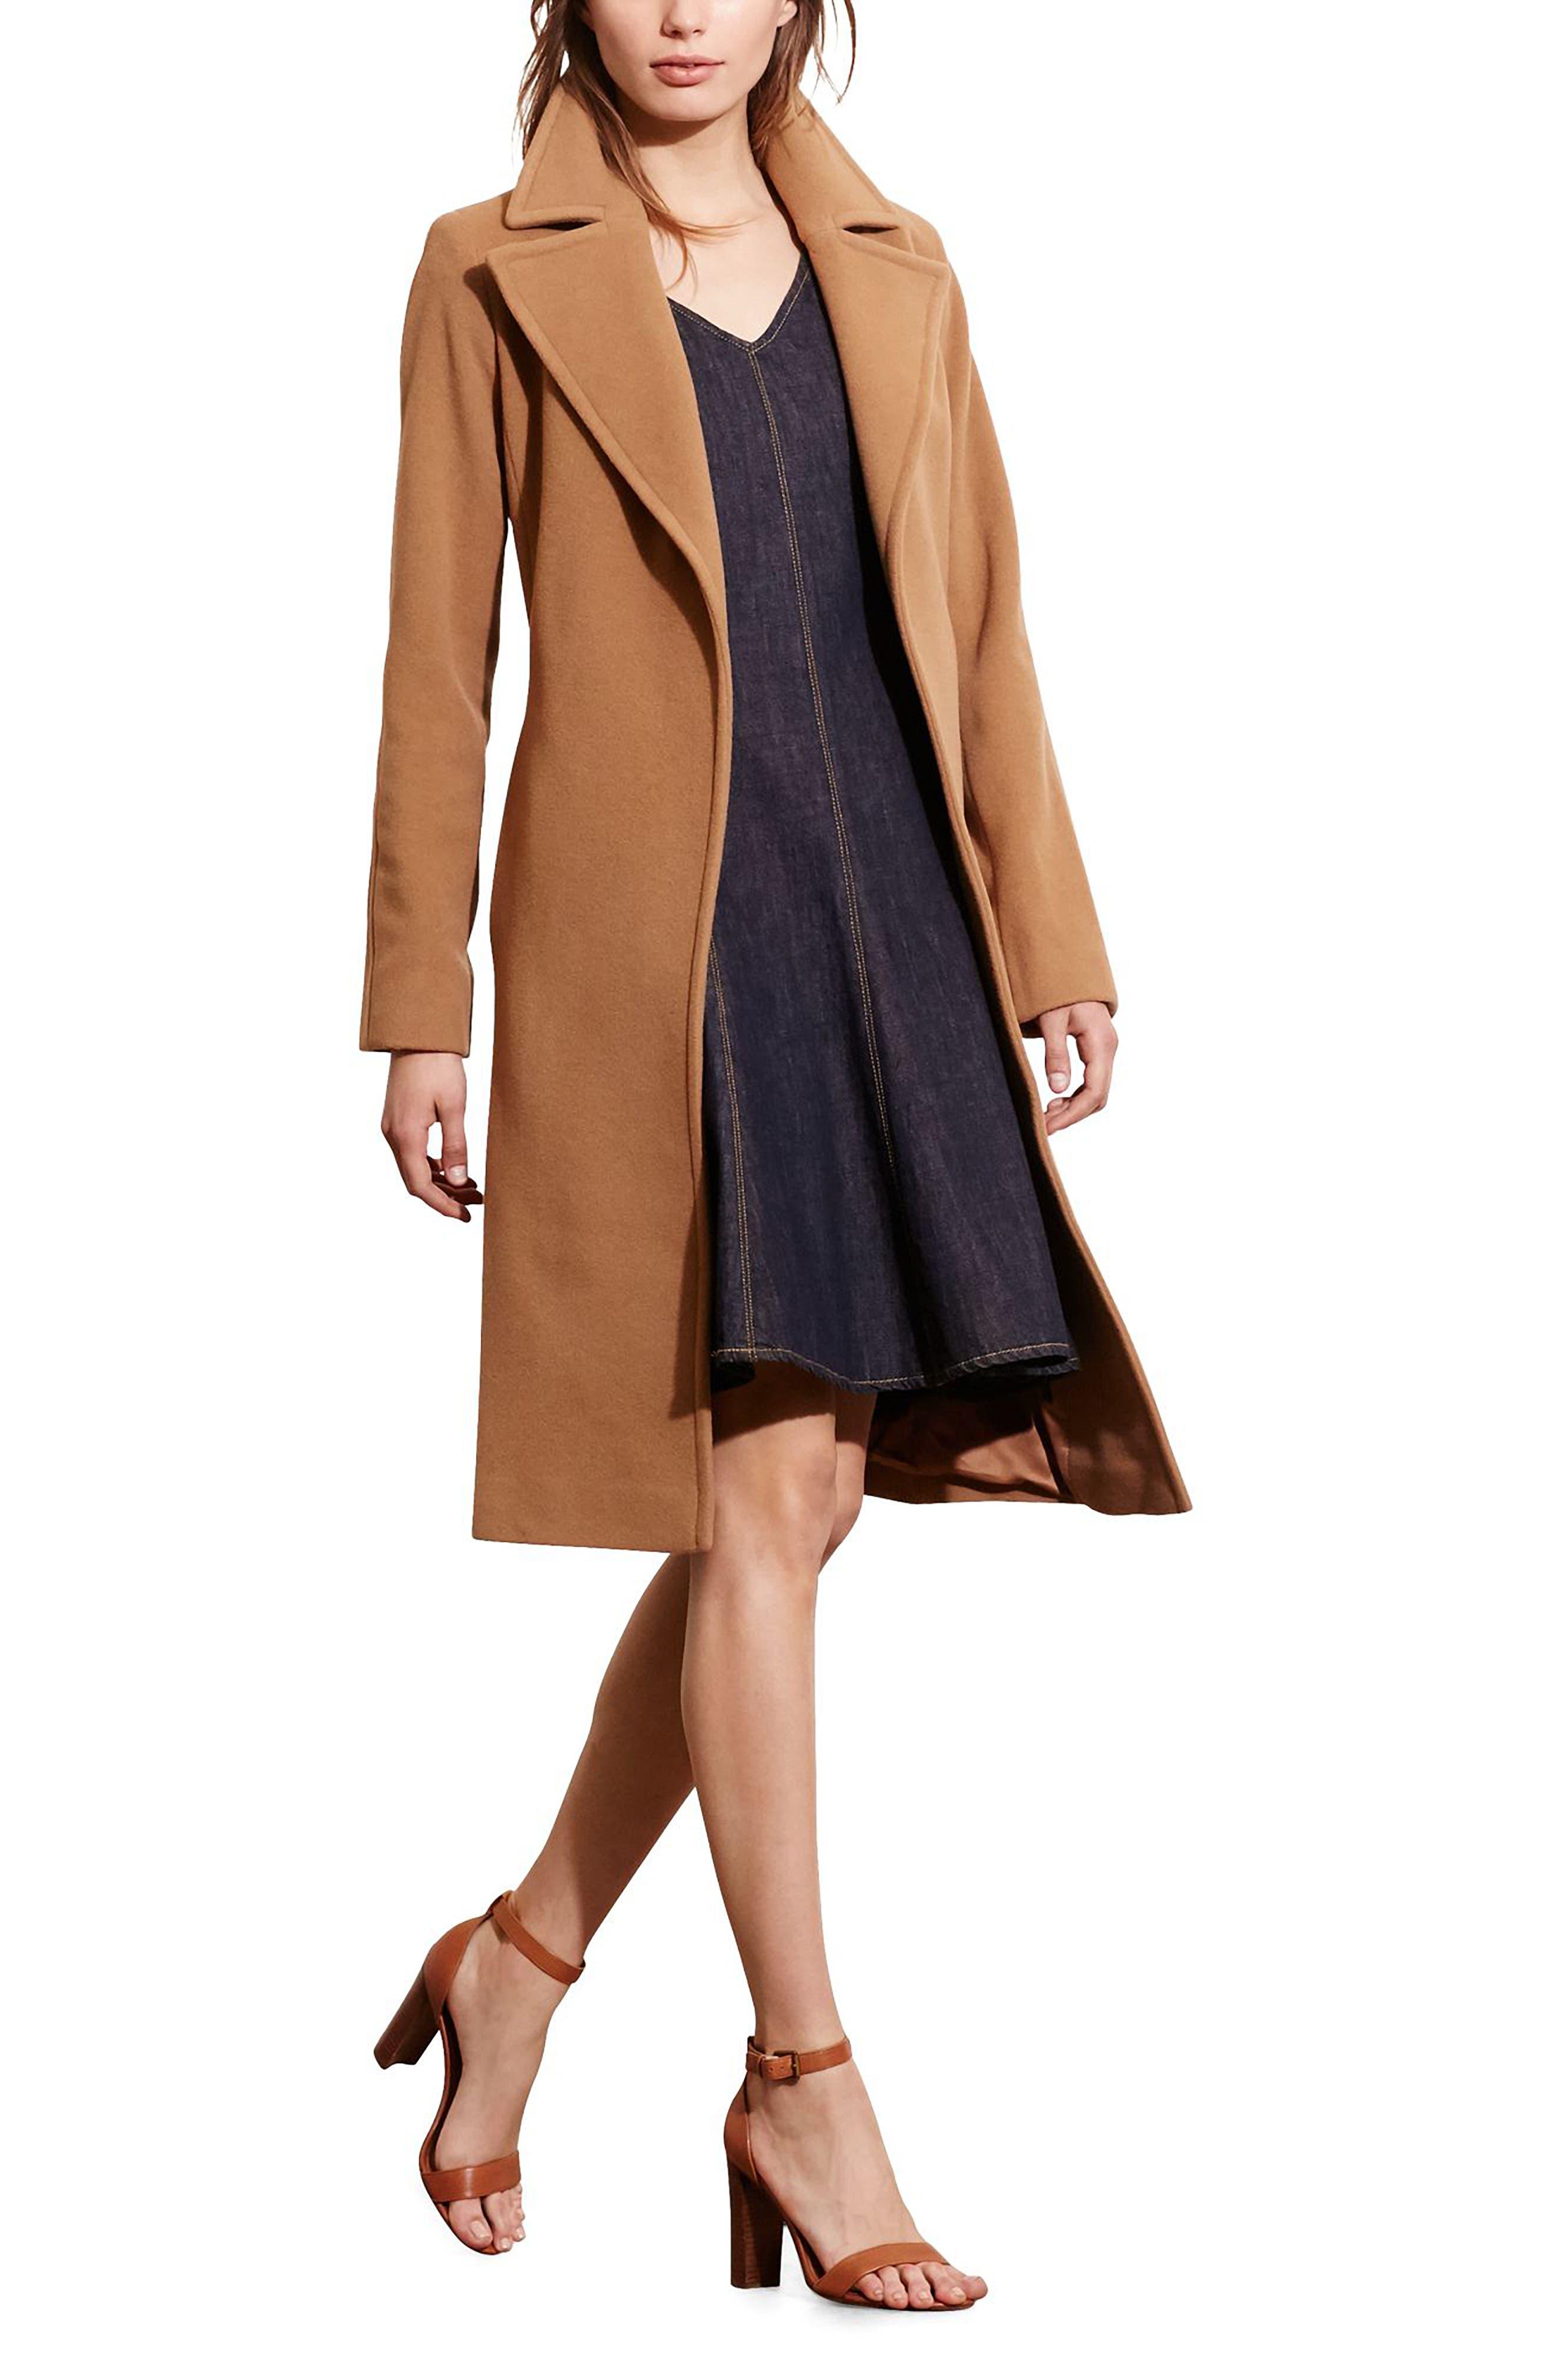 LAUREN RALPH LAUREN, Wool Blend Wrap Coat, Alternate thumbnail 4, color, 256